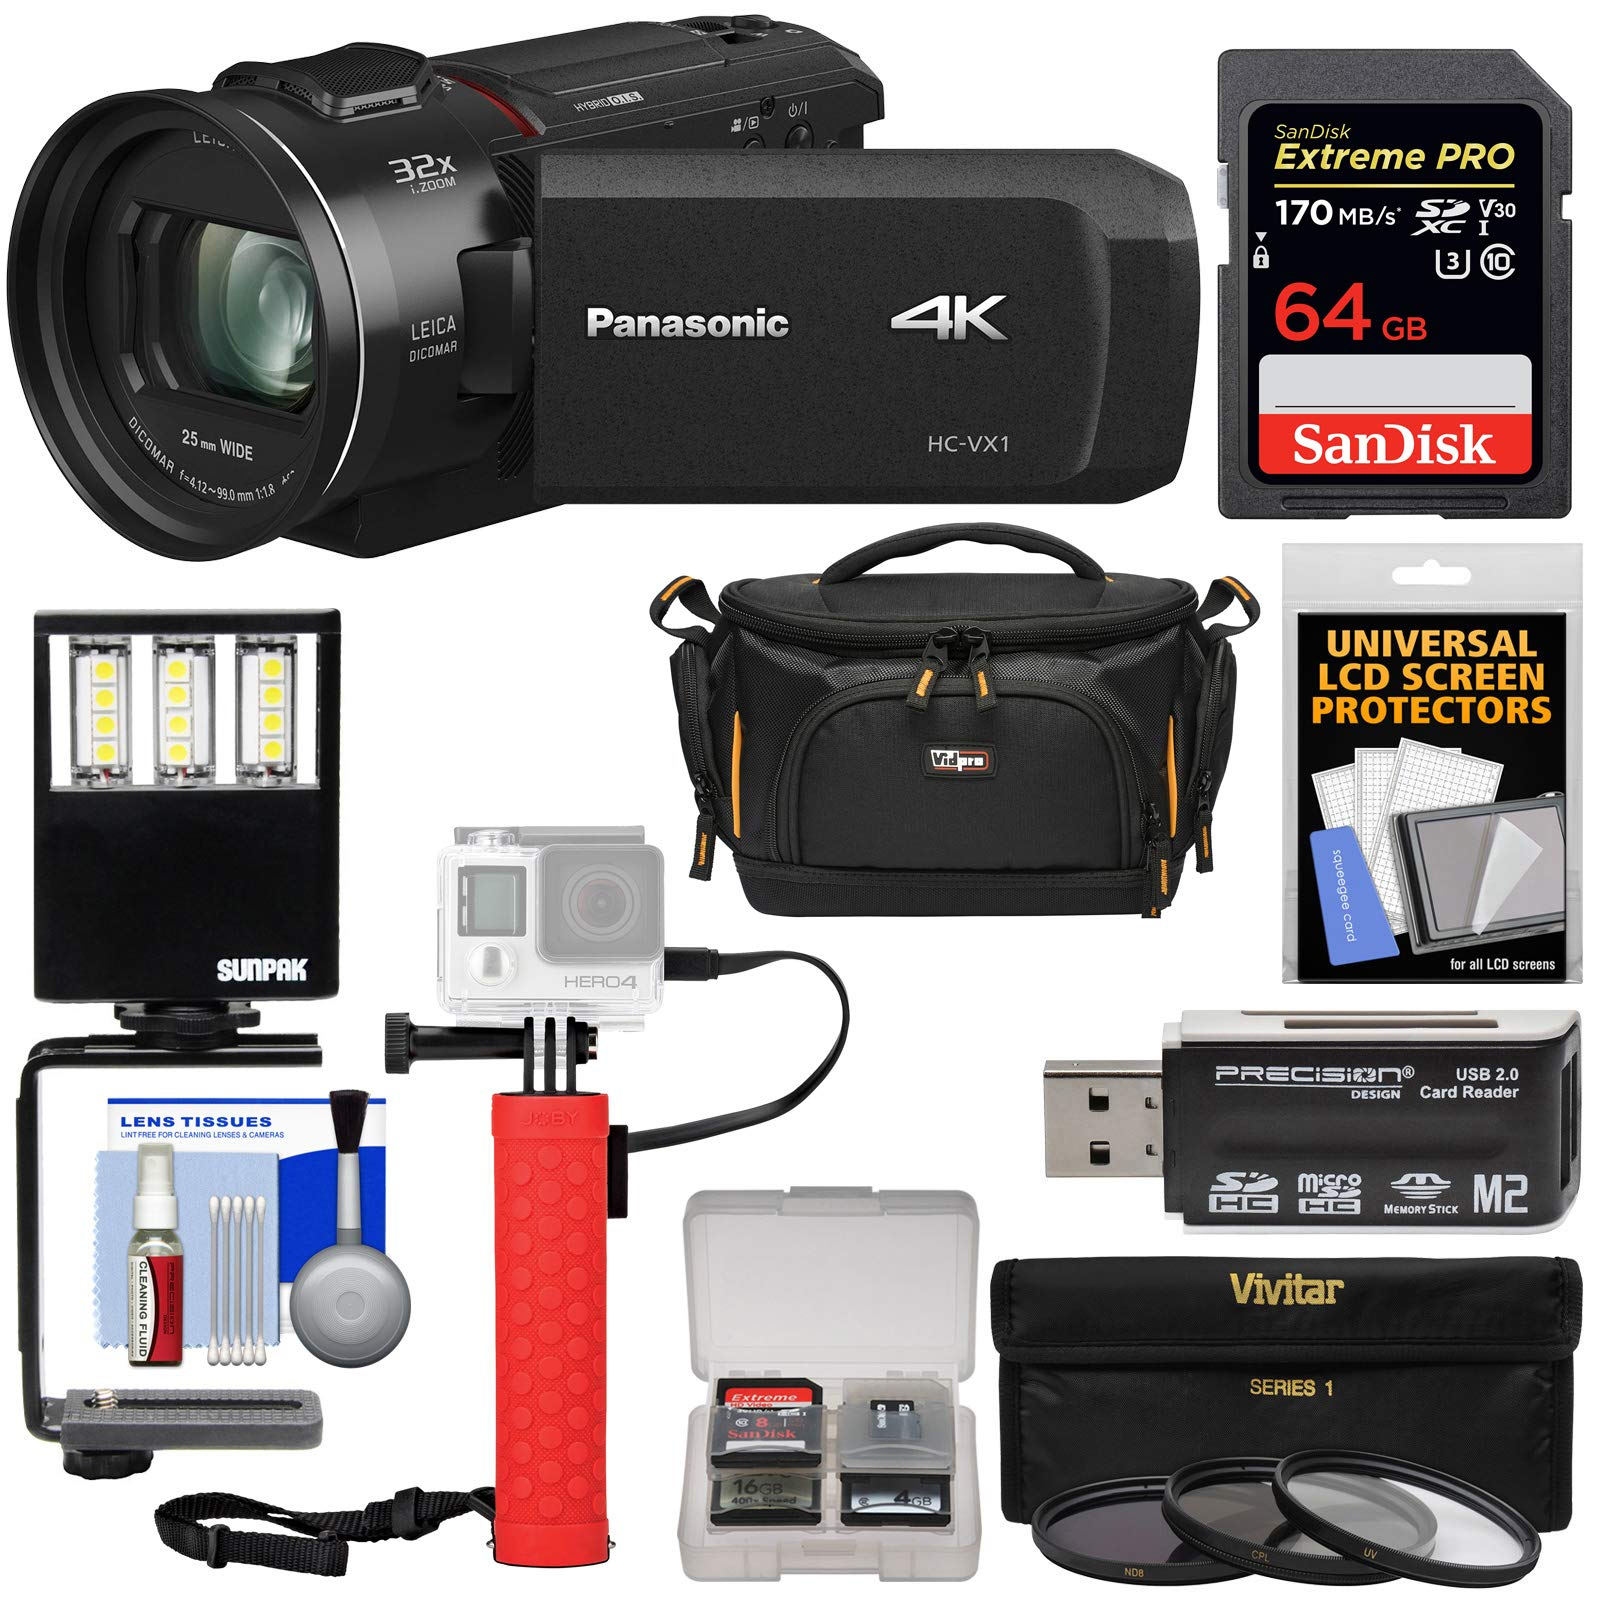 Panasonic HC-VX1 Wi-Fi 4K Ultra HD Video Camera Camcorder with 64GB Card + Battery Hand Grip + Case + 3 UV/CPL/ND8 Filters + LED Video Light + Kit by Panasonic